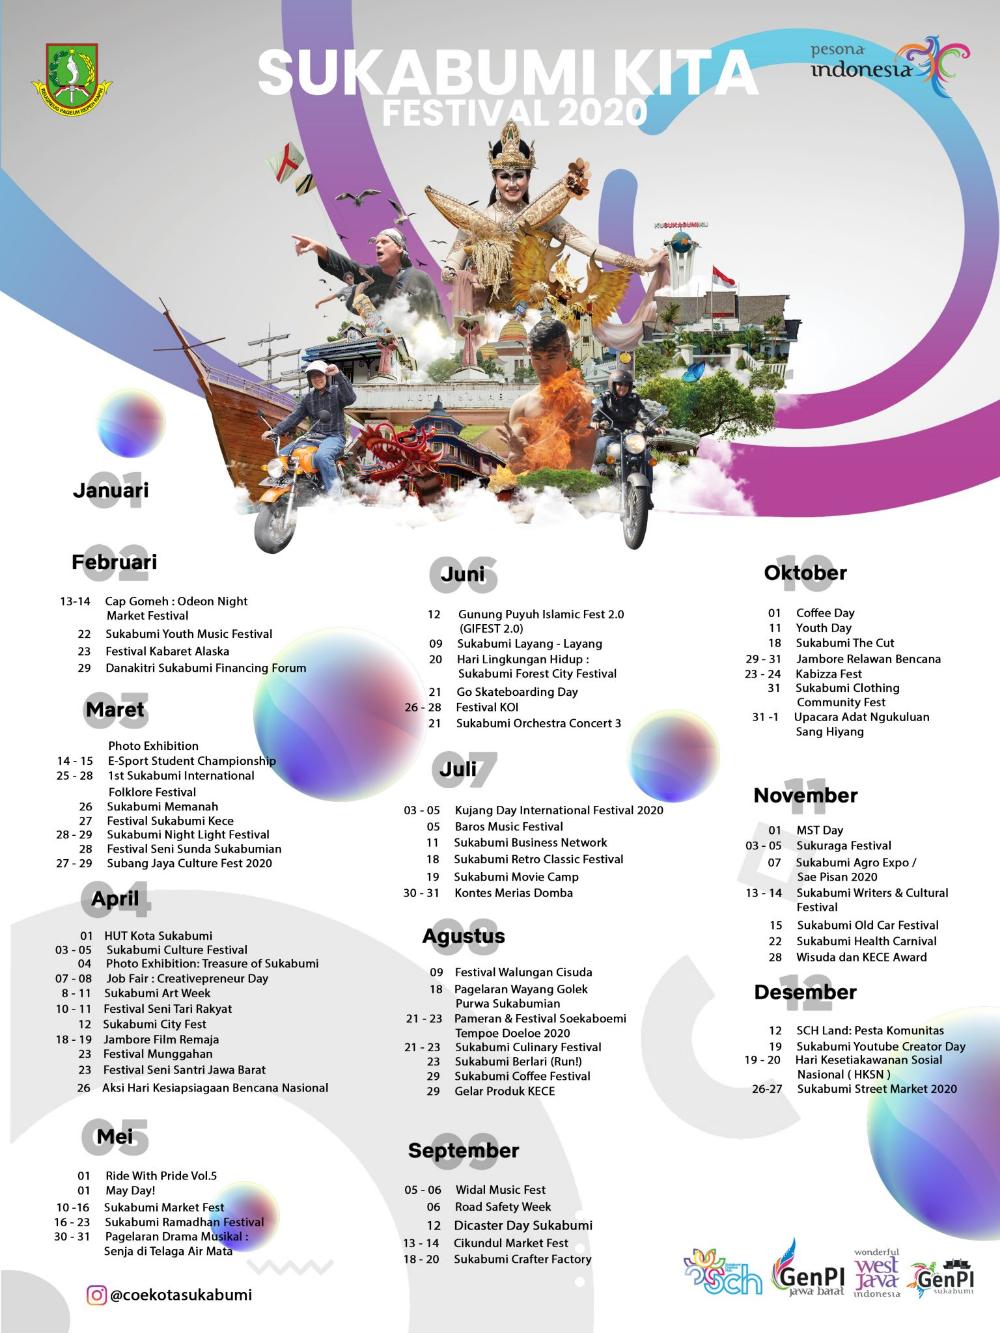 West Java Calendar Of Events 2020 Gps Wisata Indonesia Kota Kalimantan Indonesia